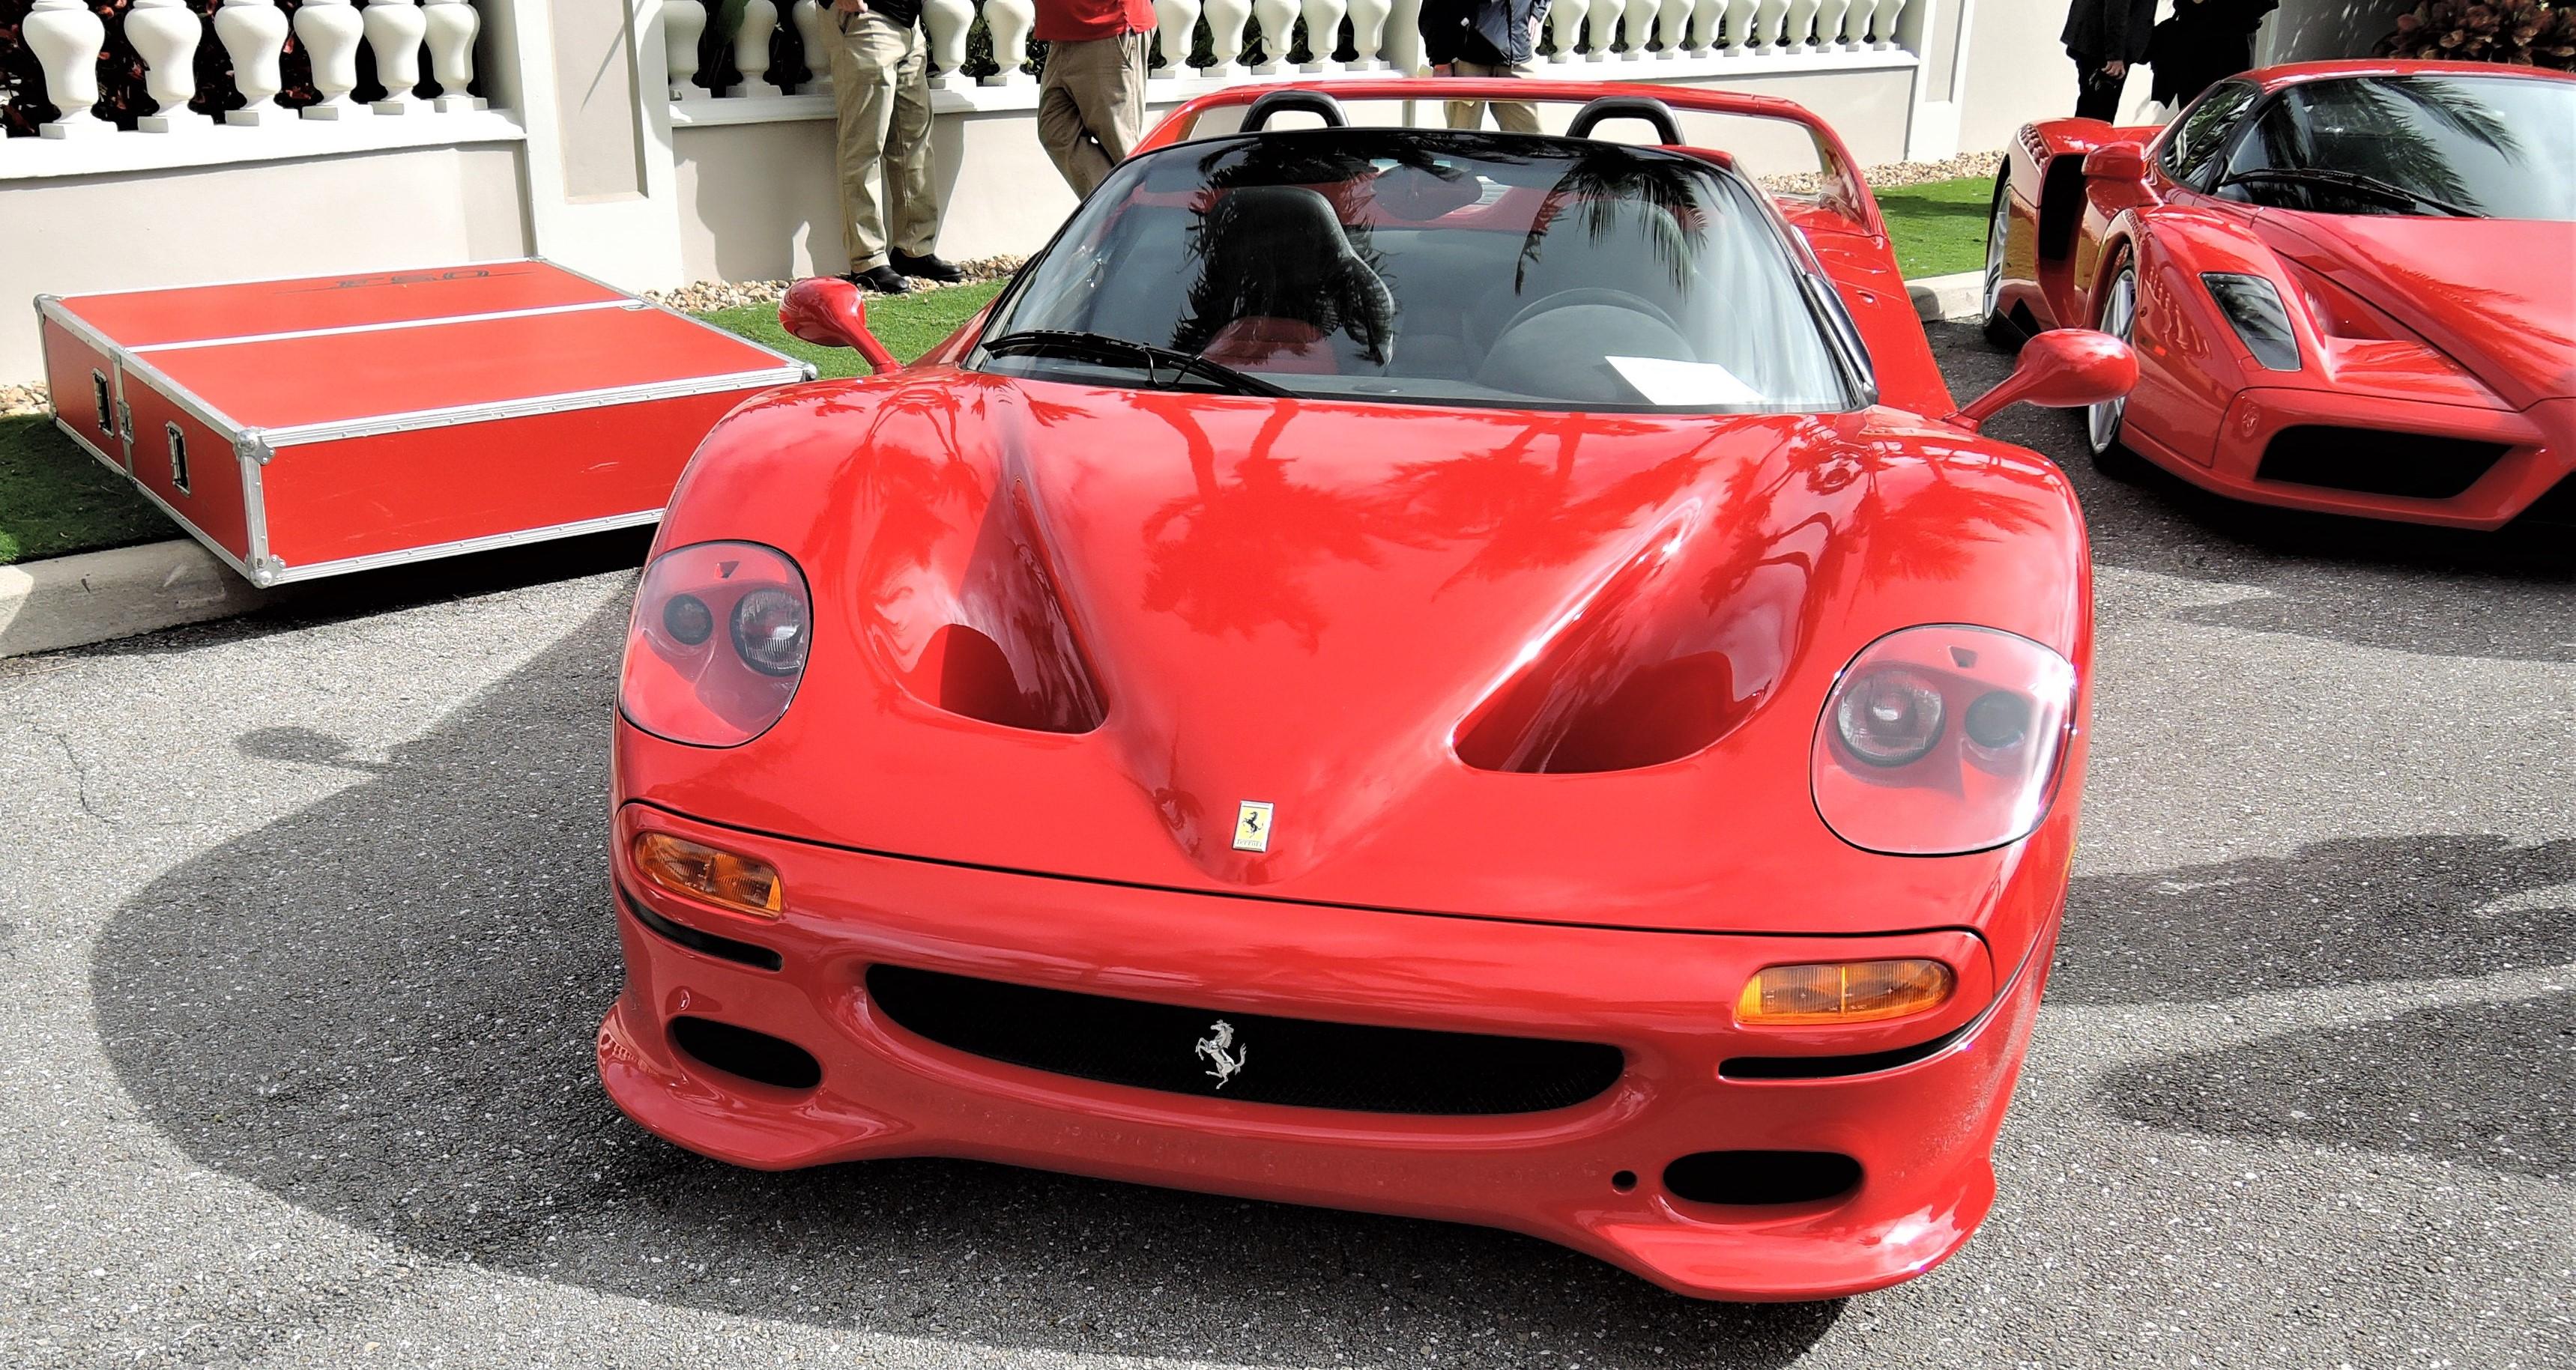 red 1995 Ferrari F50; Sn 103351 - Cavallino 2018 Concours